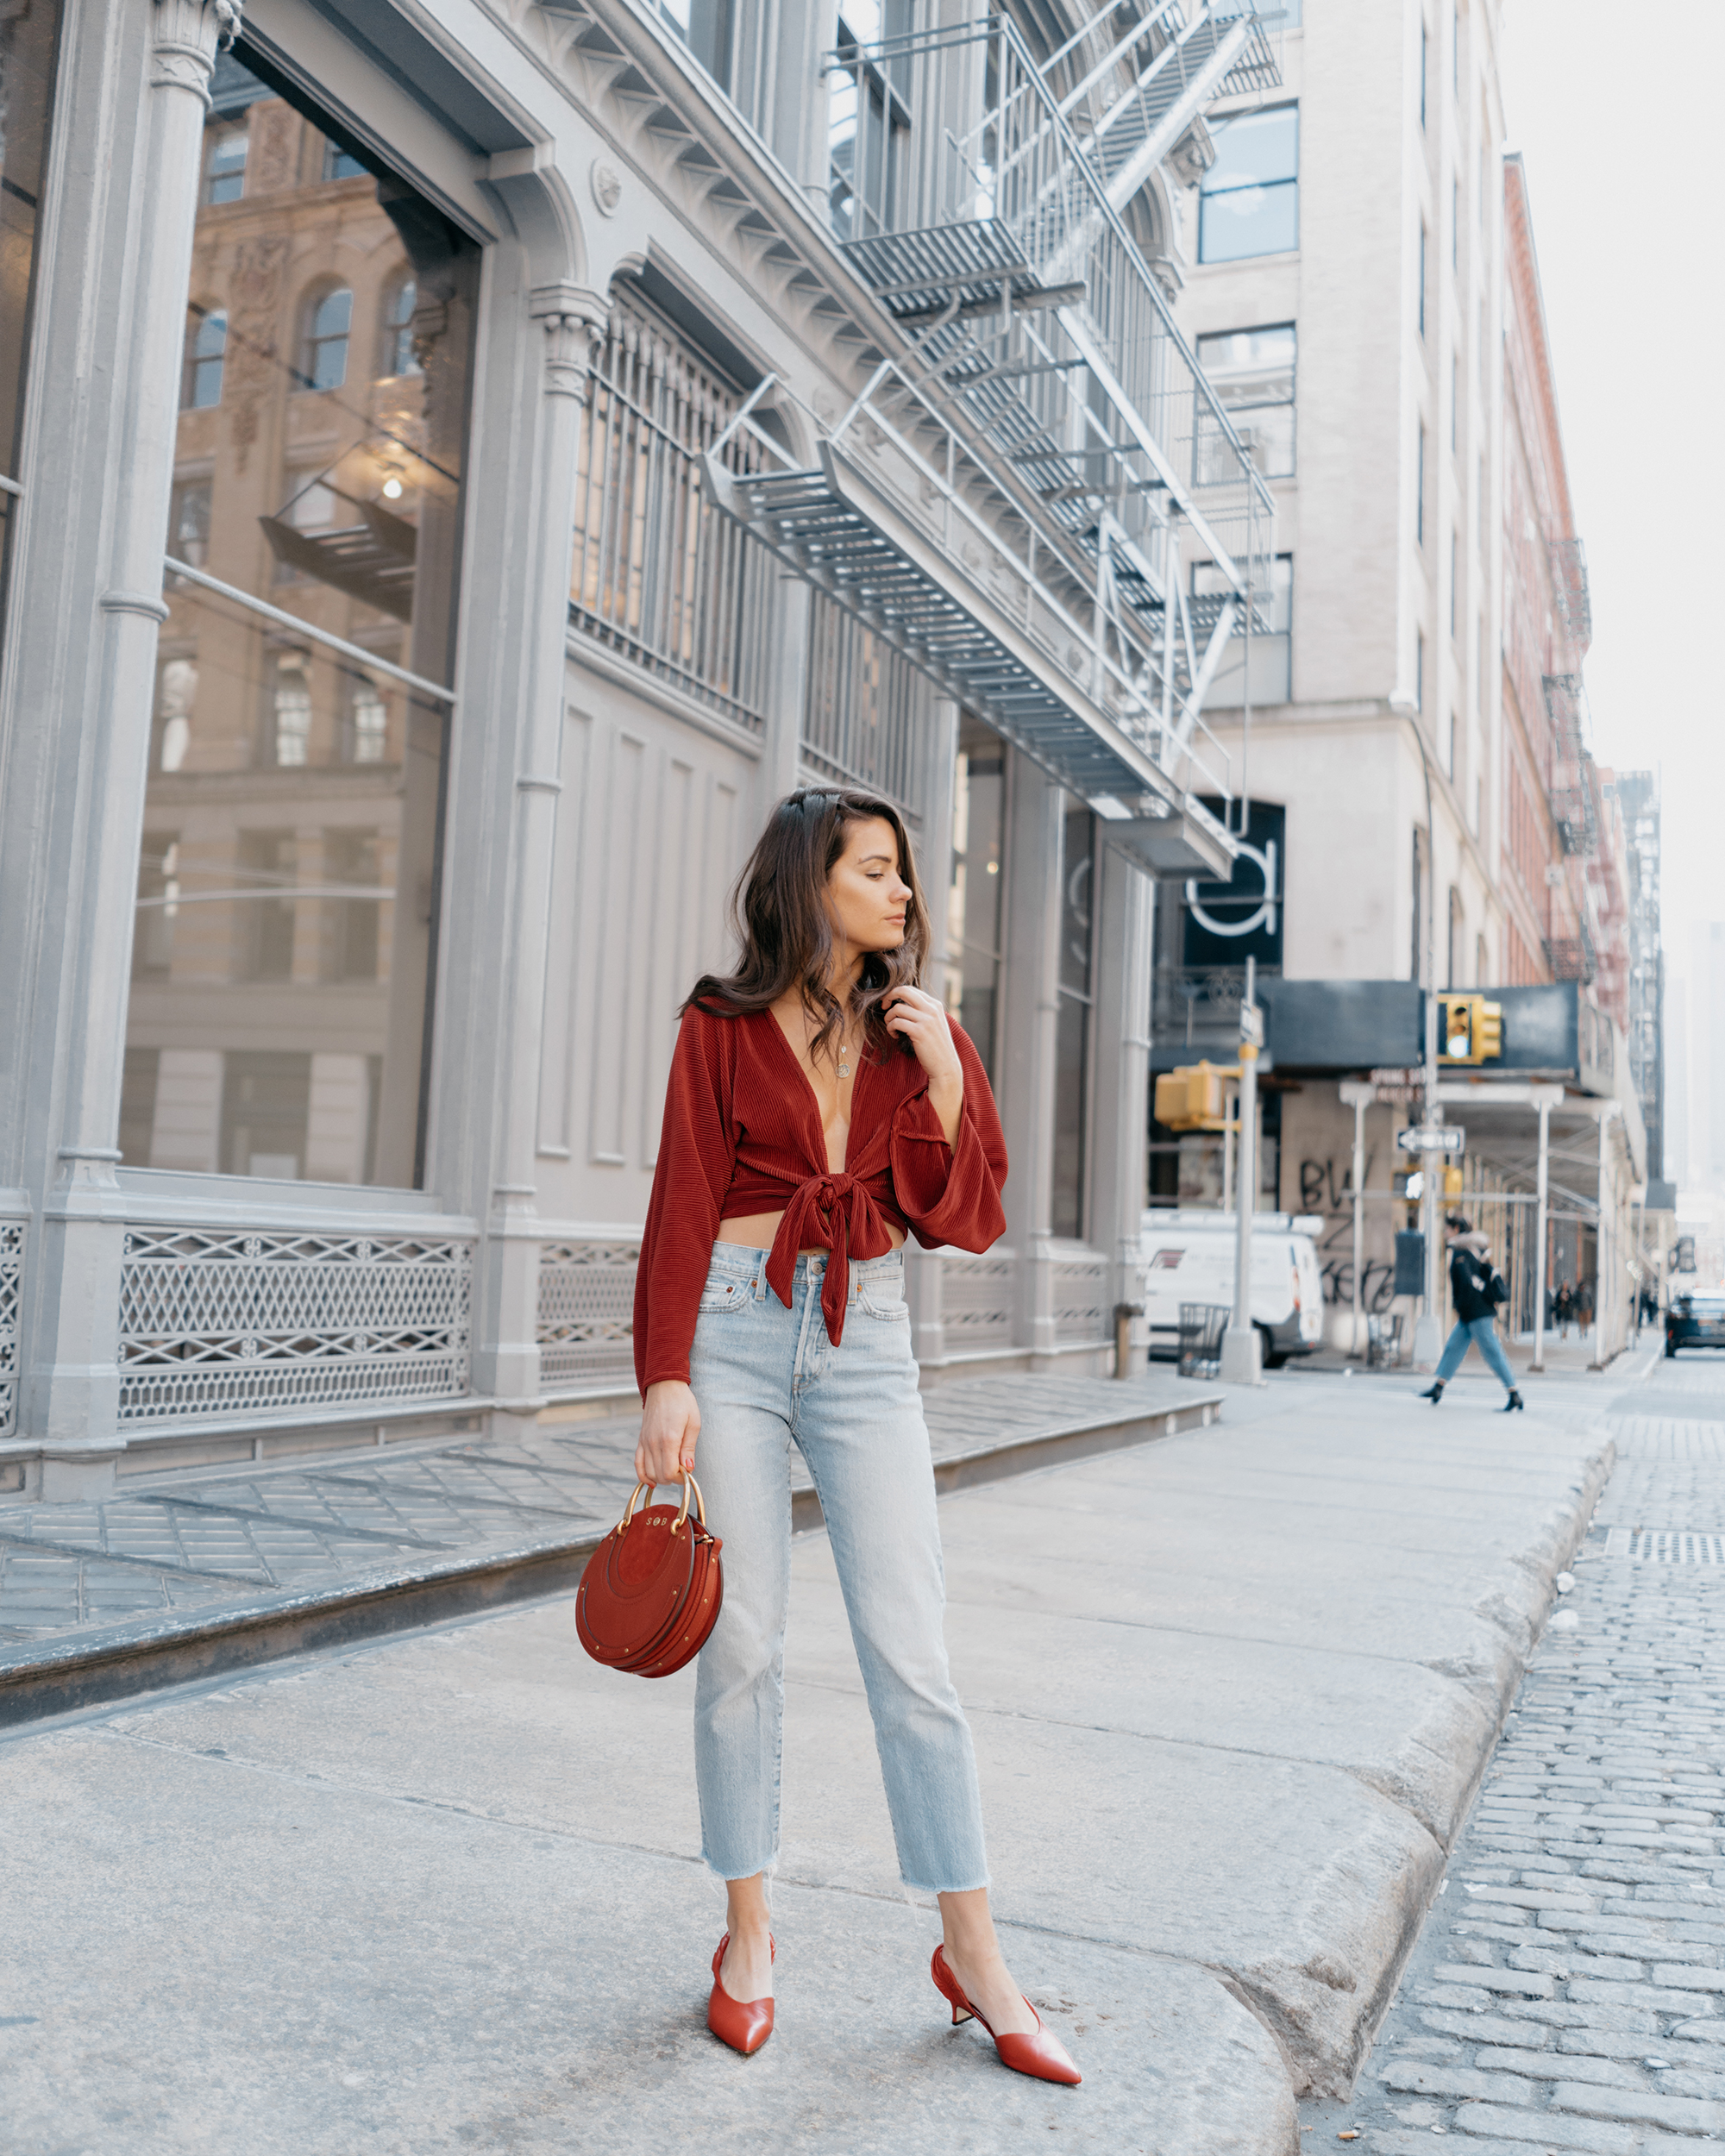 Red-Kimono-Tie-Front-Top-Ruby-Chloe-Pixie-Leather-Crossbody-Bag-1.jpg